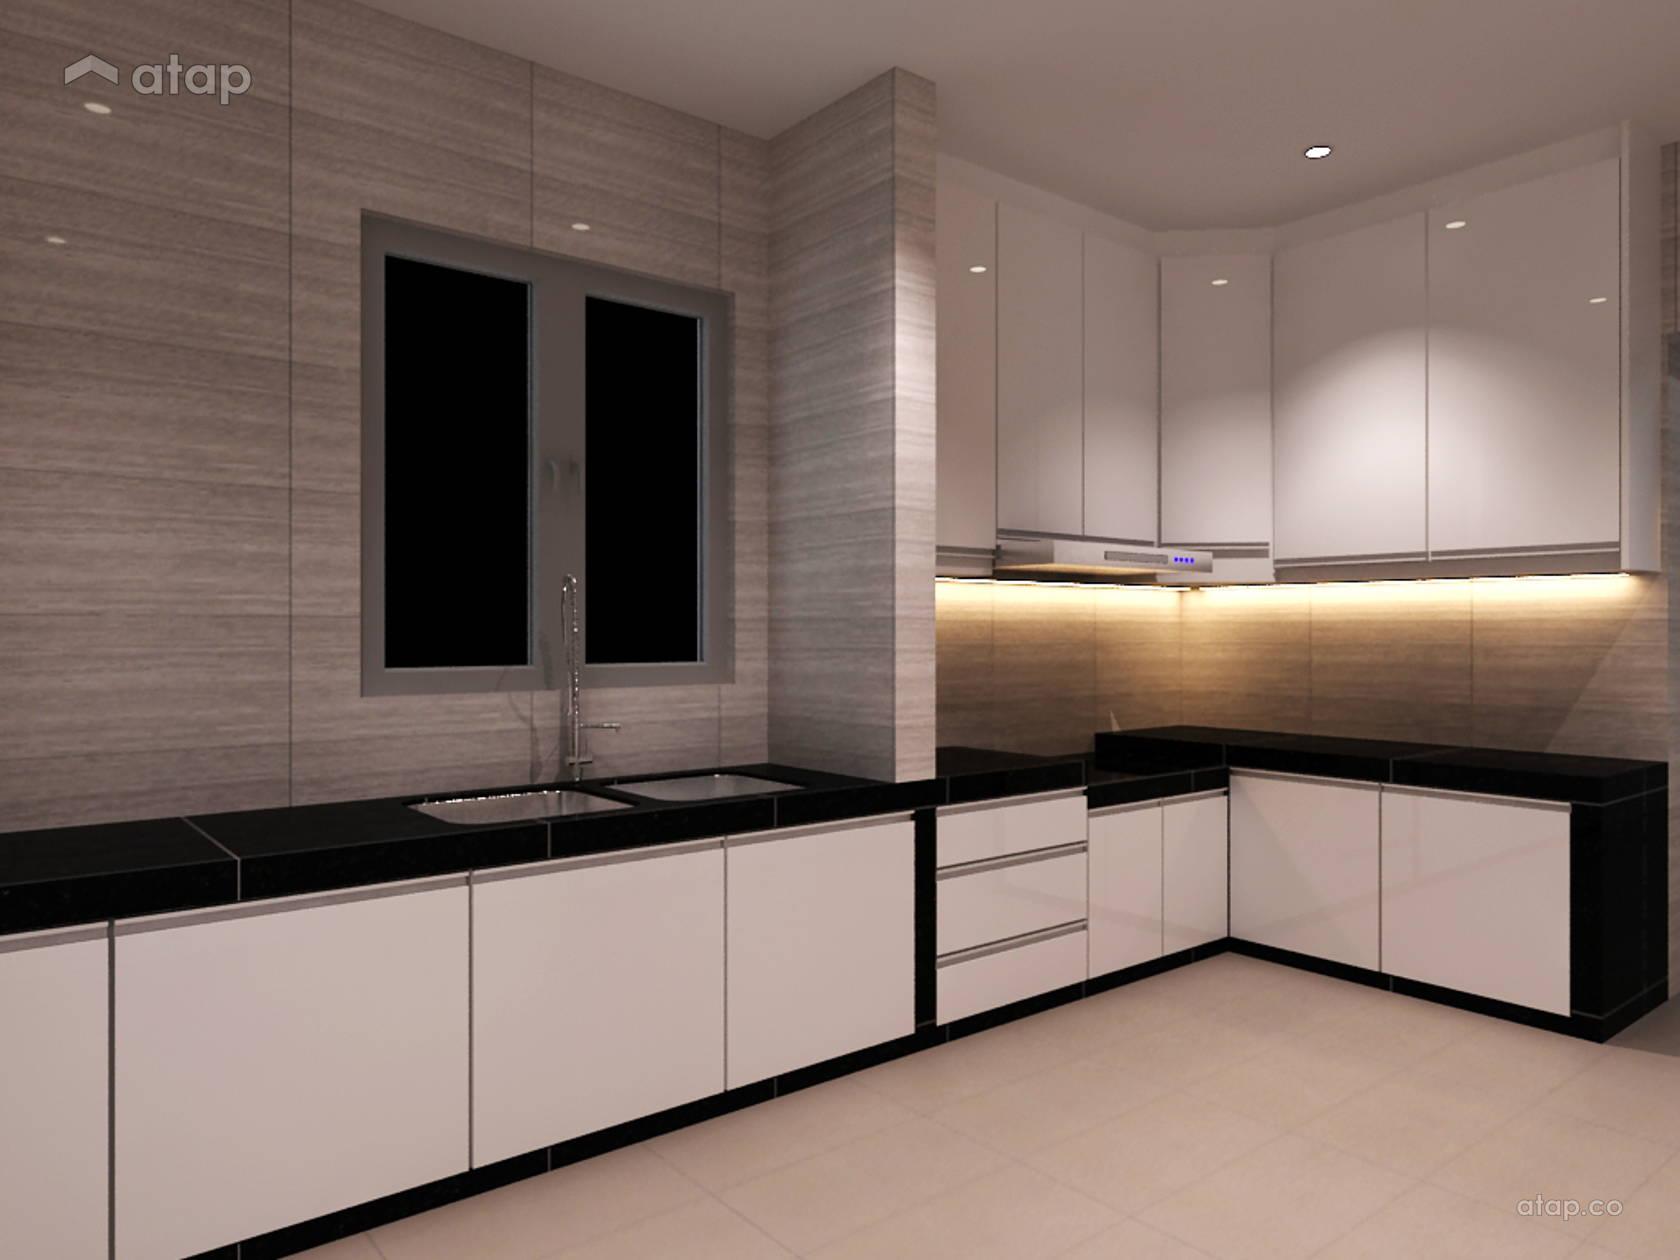 single storey bungalow interior design renovation ideas photos and